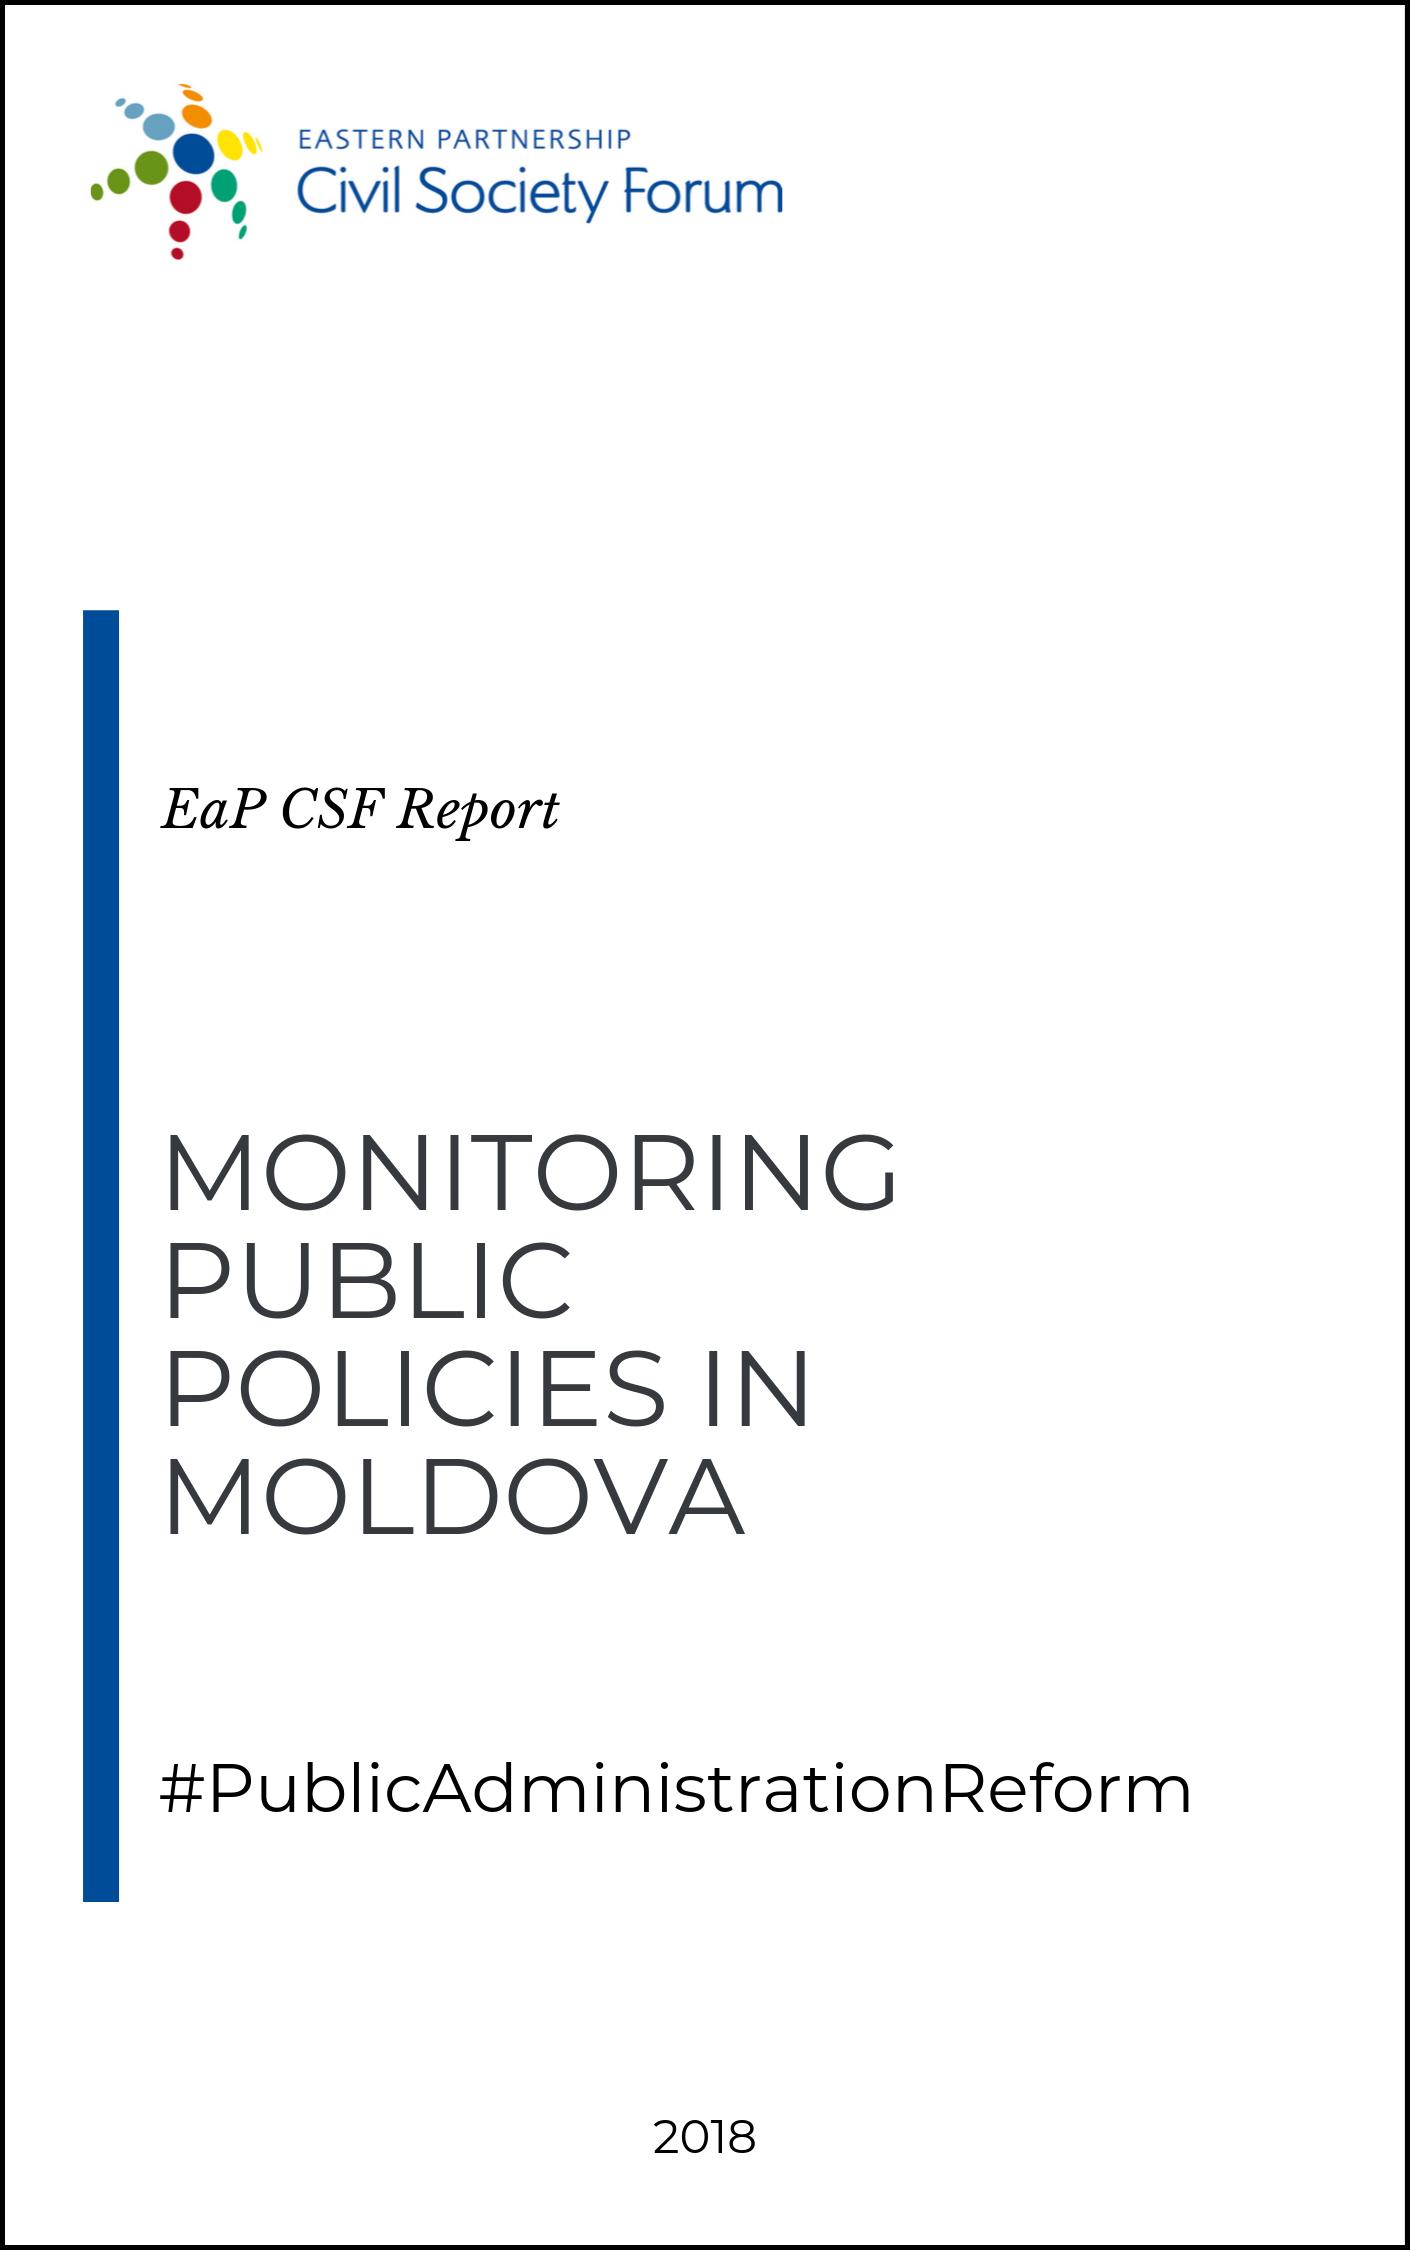 Monitoring Public Policies in Moldova